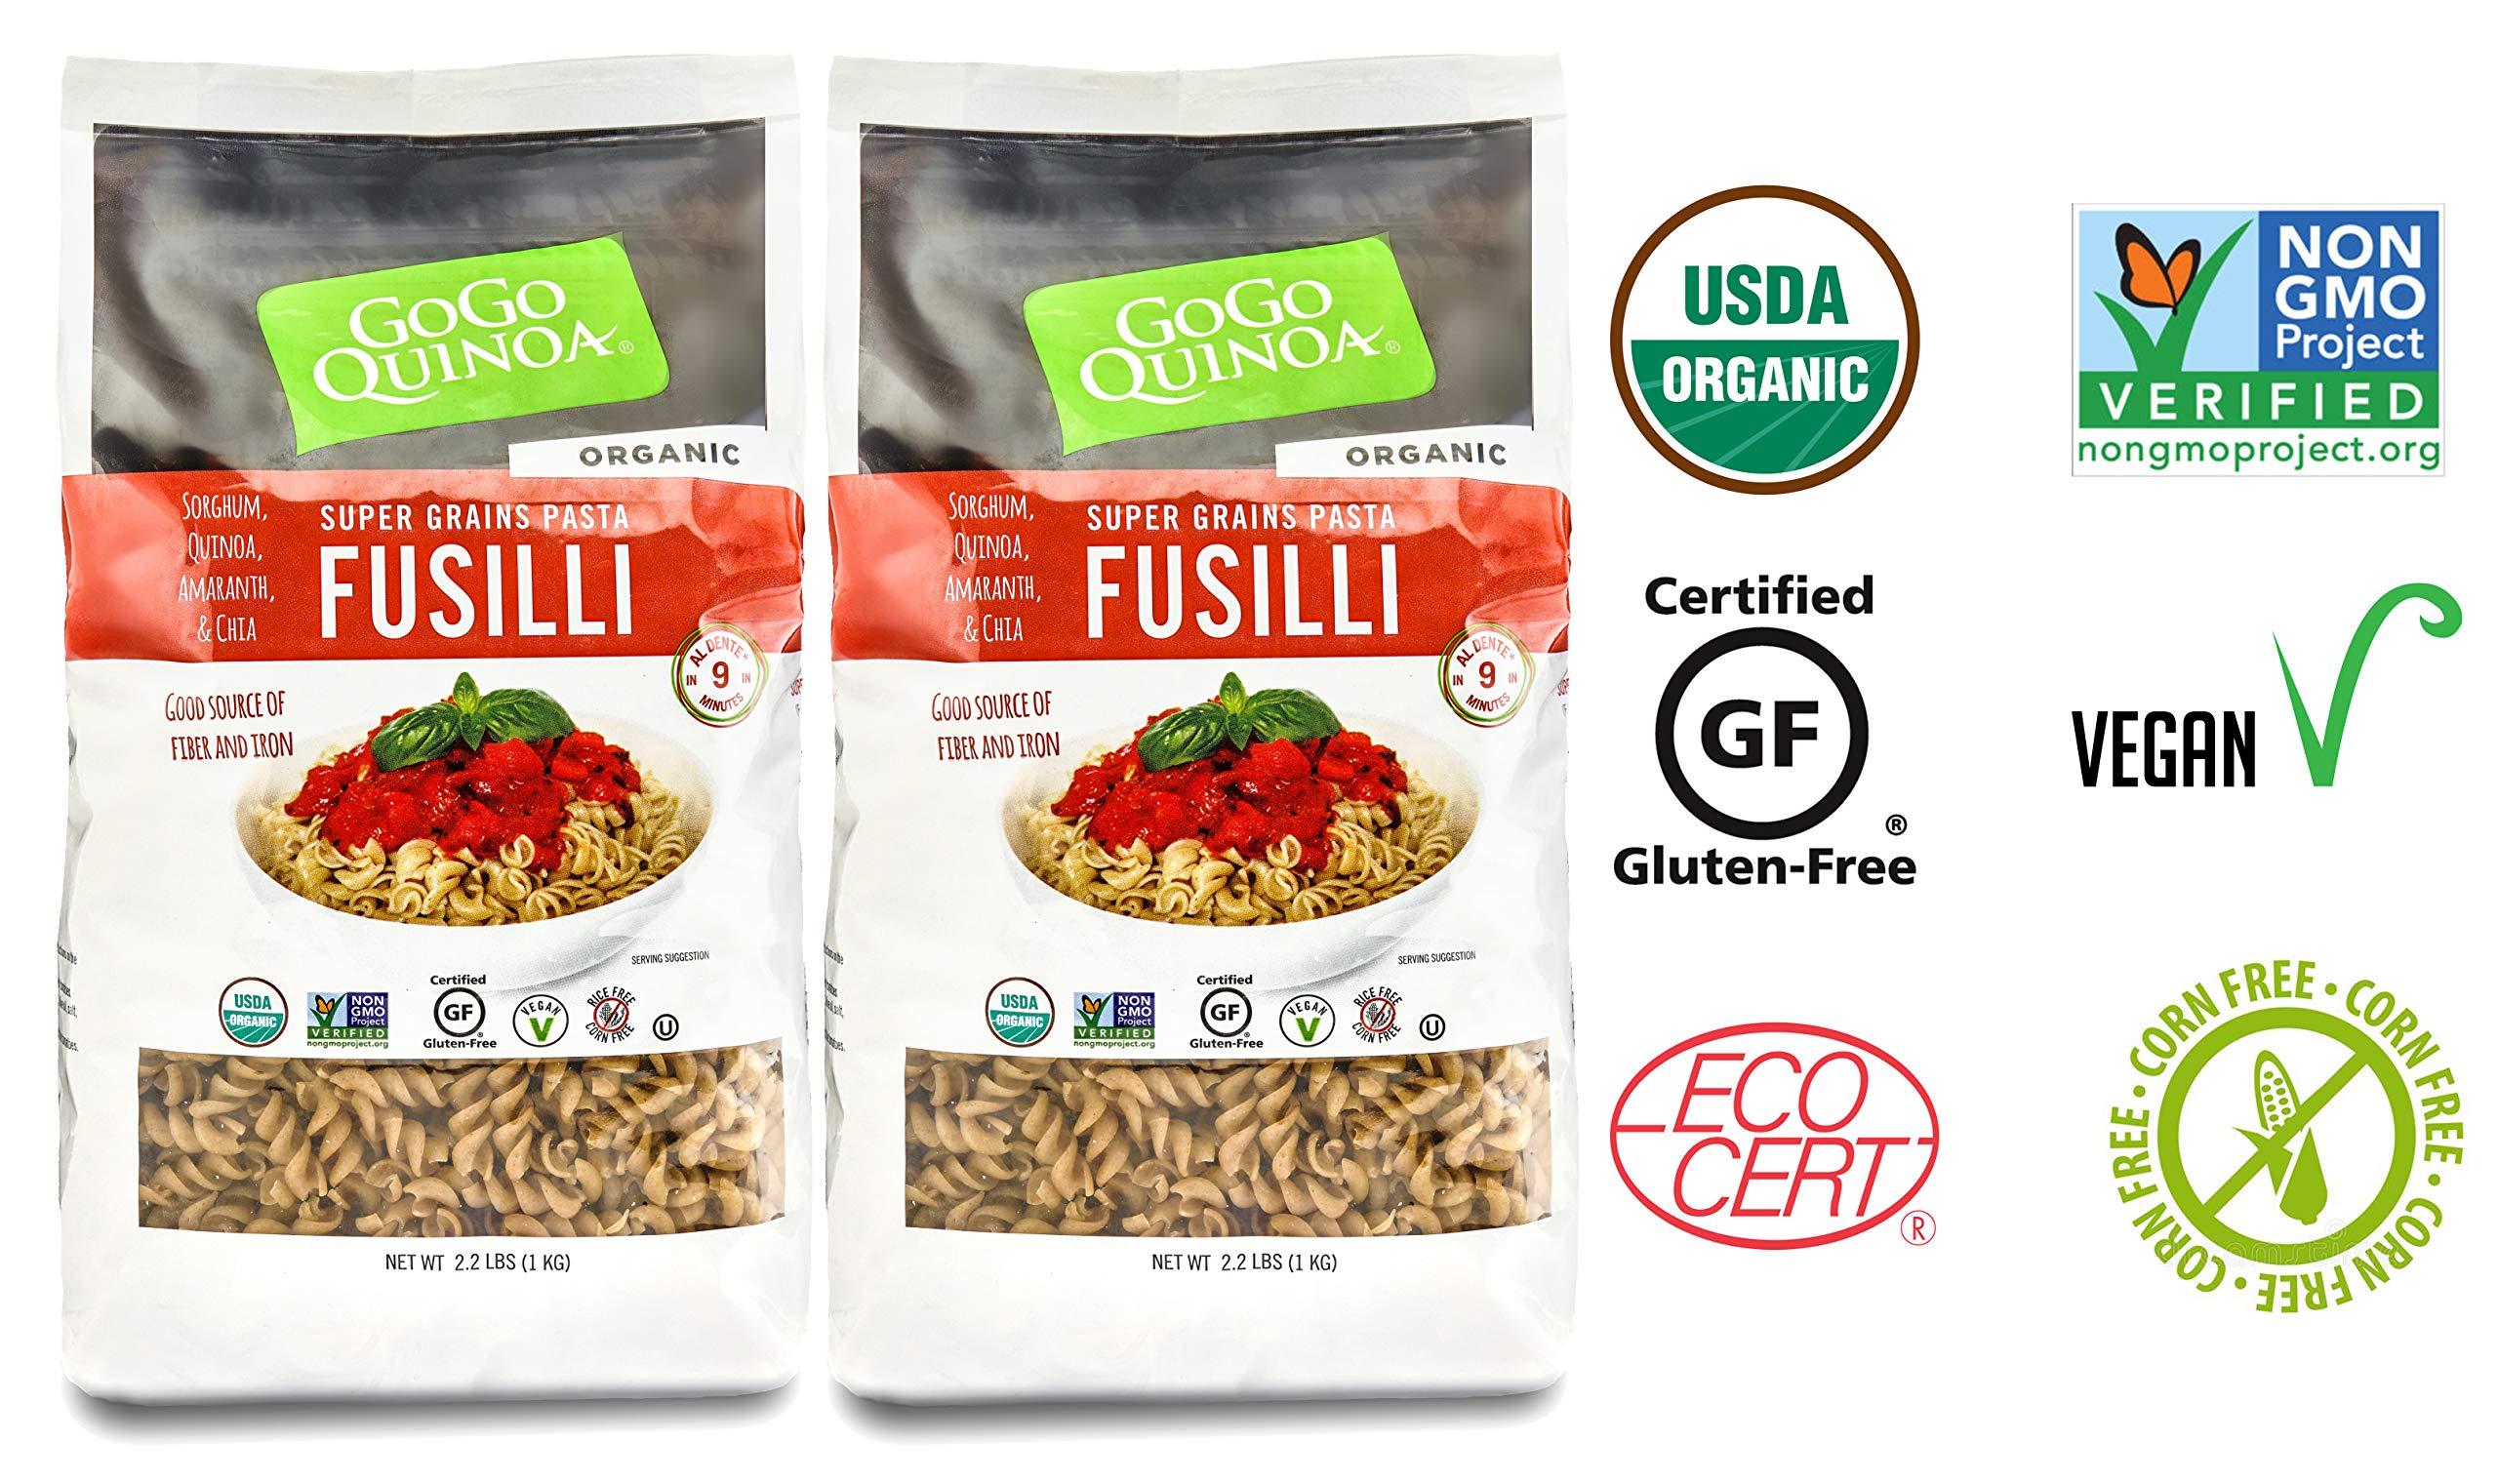 GoGo Quinoa Organic Supergrains Fusilli Pasta, Vegan, Gluten Free Dry Pasta, 35.2 oz x 2 by GoGo Quinoa